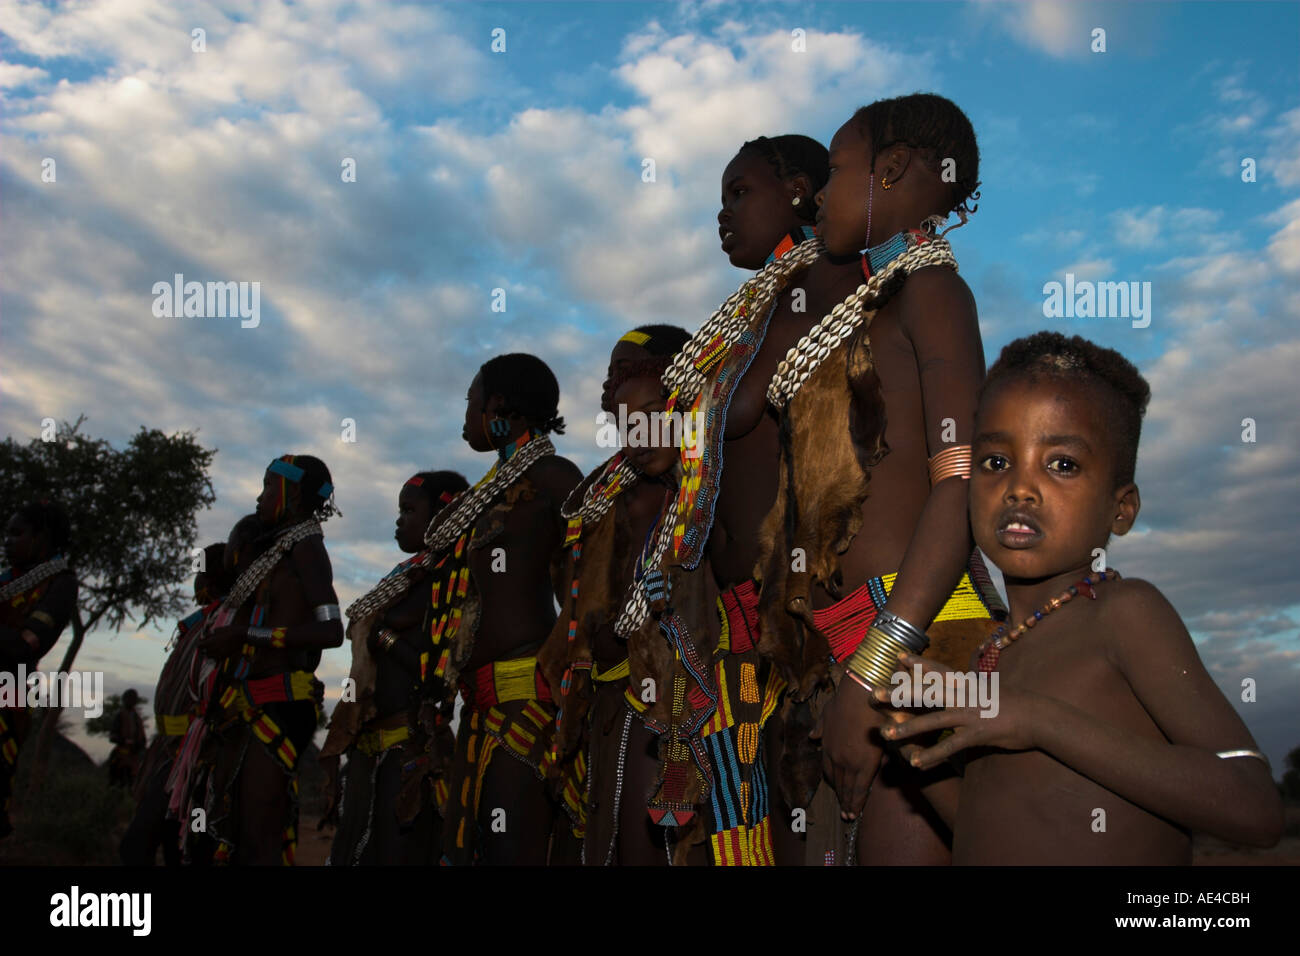 Hamer (Hamar) people at Evangadi dancing (Hamer night dance), Dombo village, Turmi, Lower Omo Valley, Ethiopia, Stock Photo